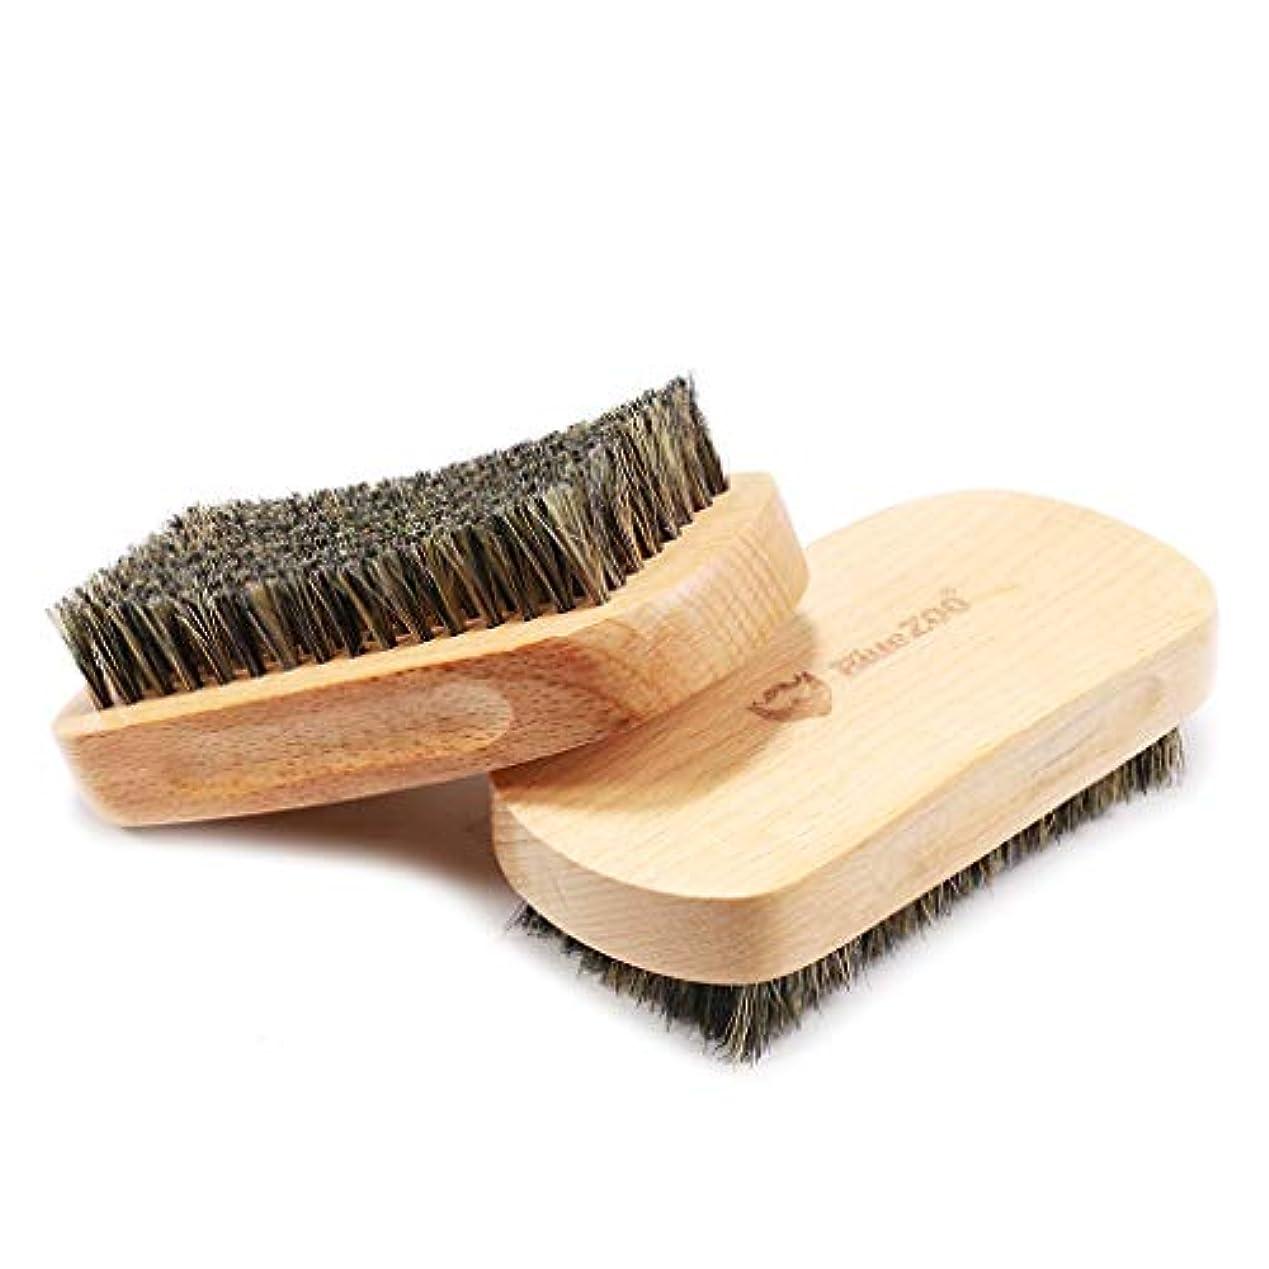 Hellery シェービングブラシ メンズ 理容 洗顔 髭剃り ひげブラシ 散髪整理 理髪用 首/顔 髭剃り